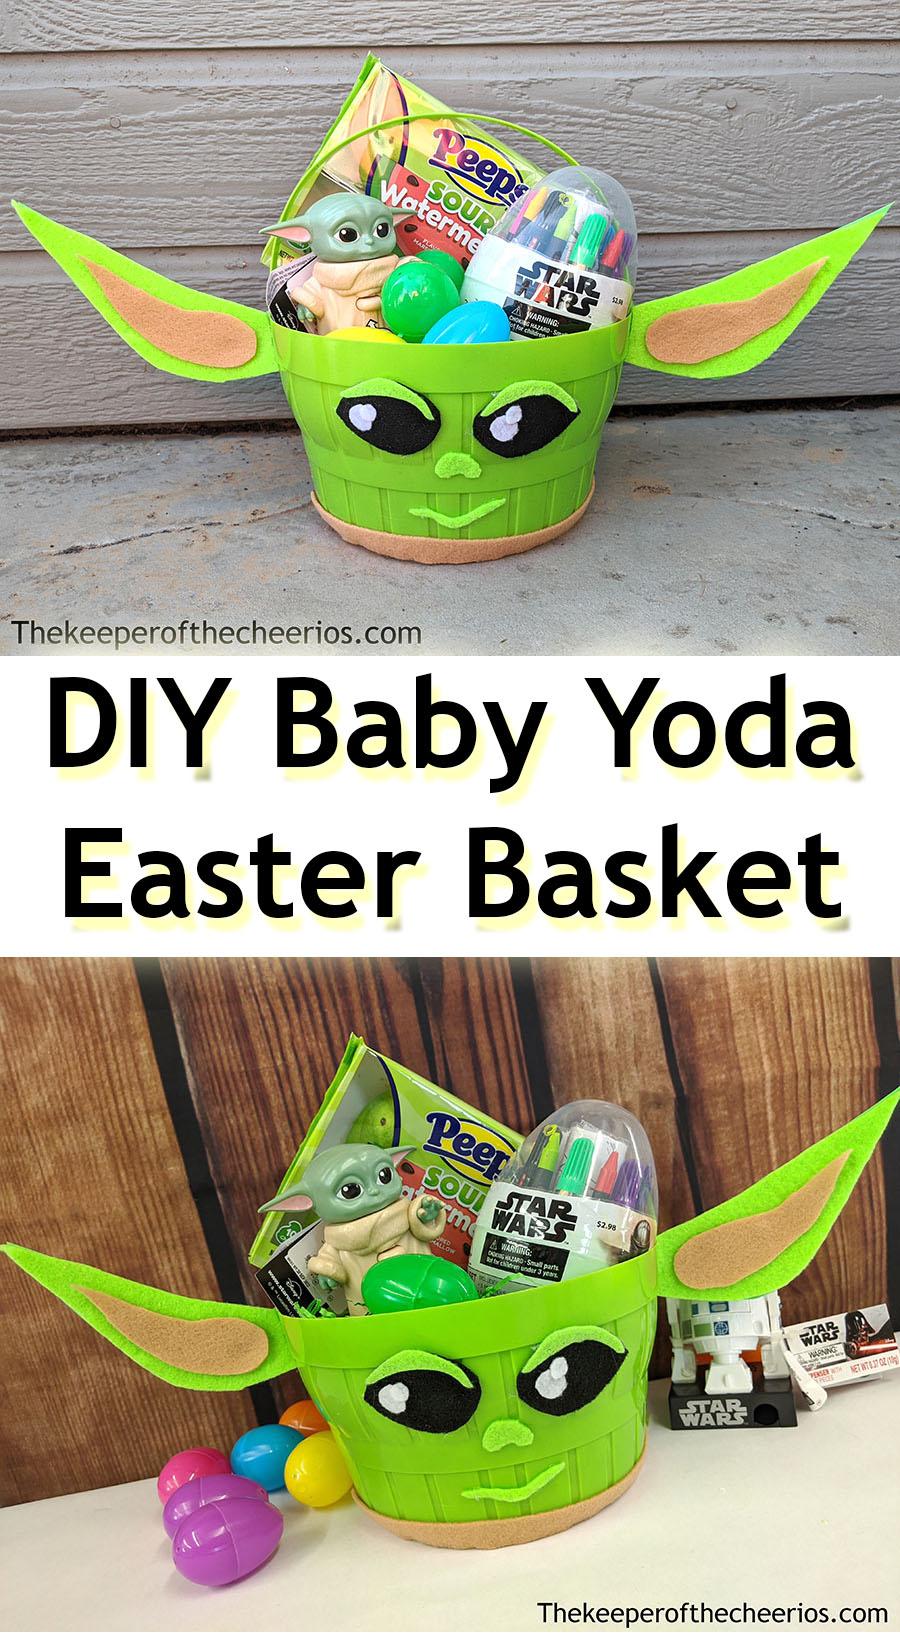 baby-yoda-easter-basket-fbb